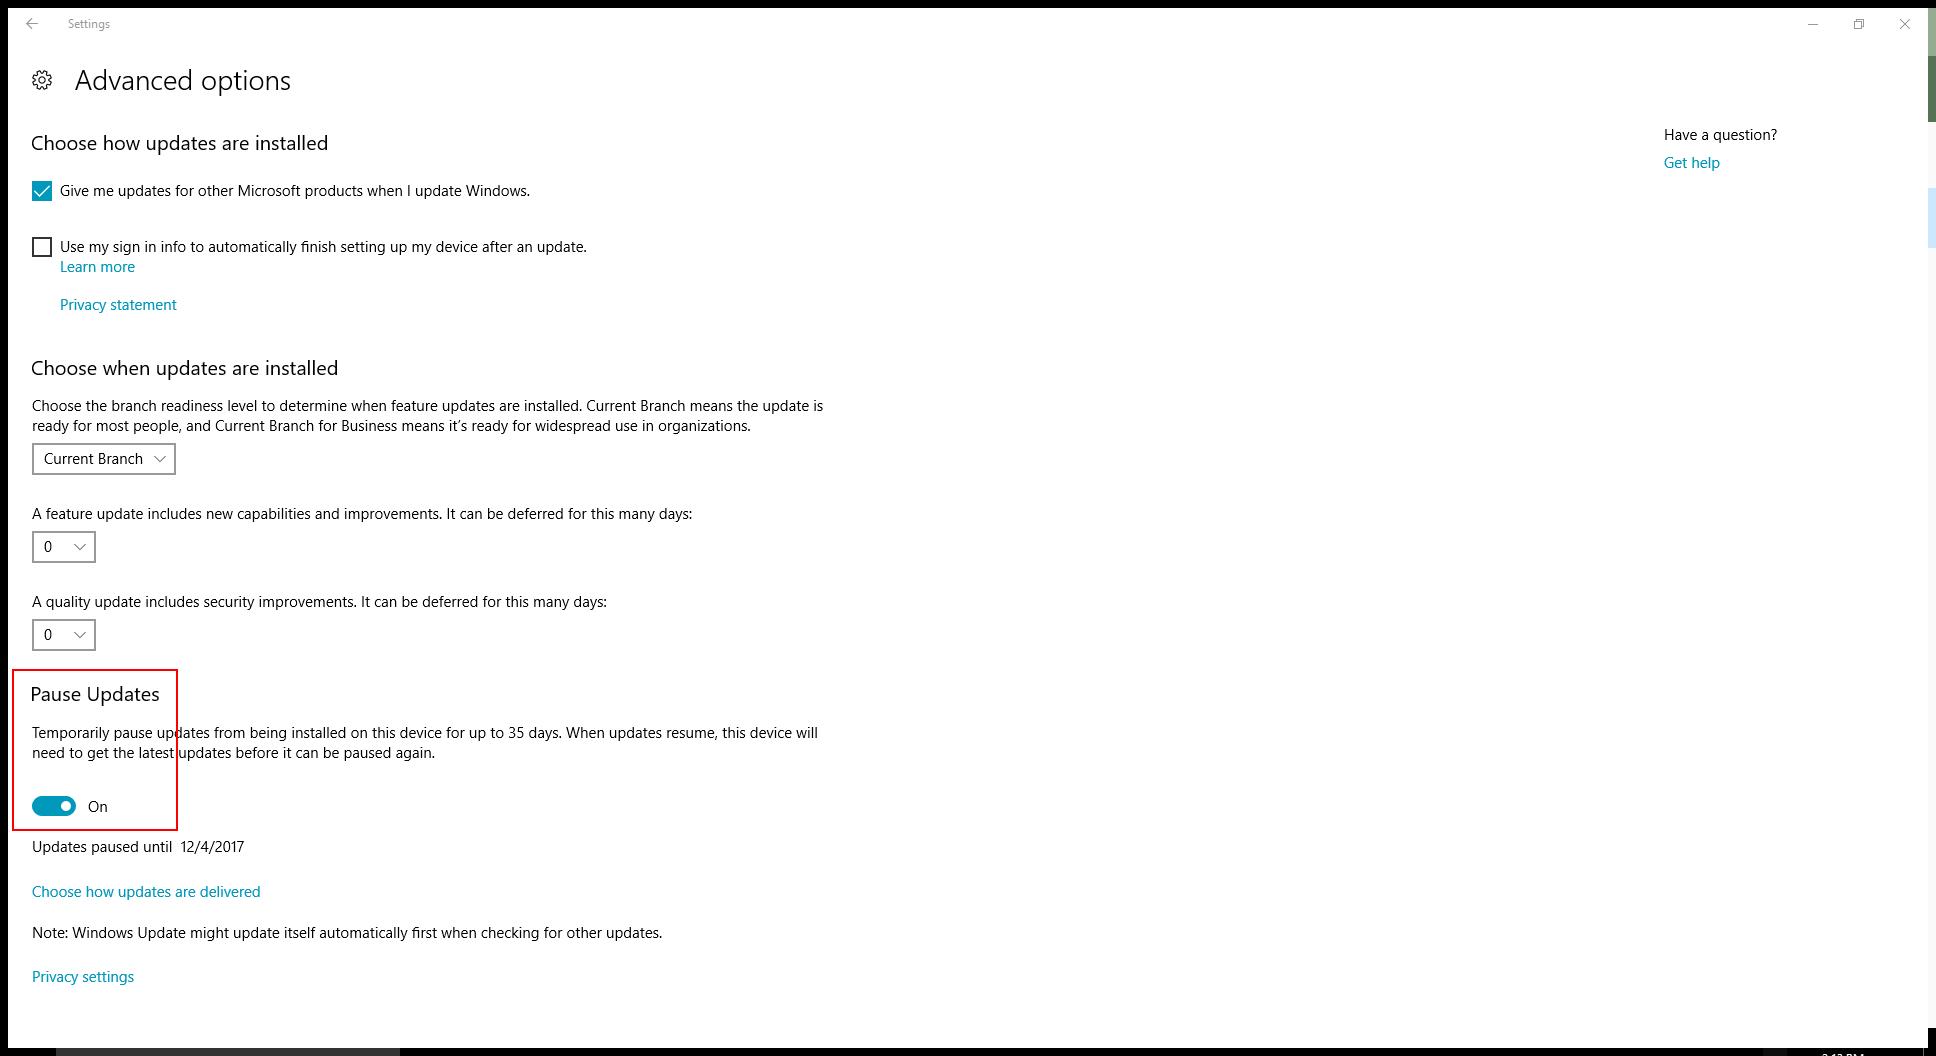 windows 10 update offline 1709